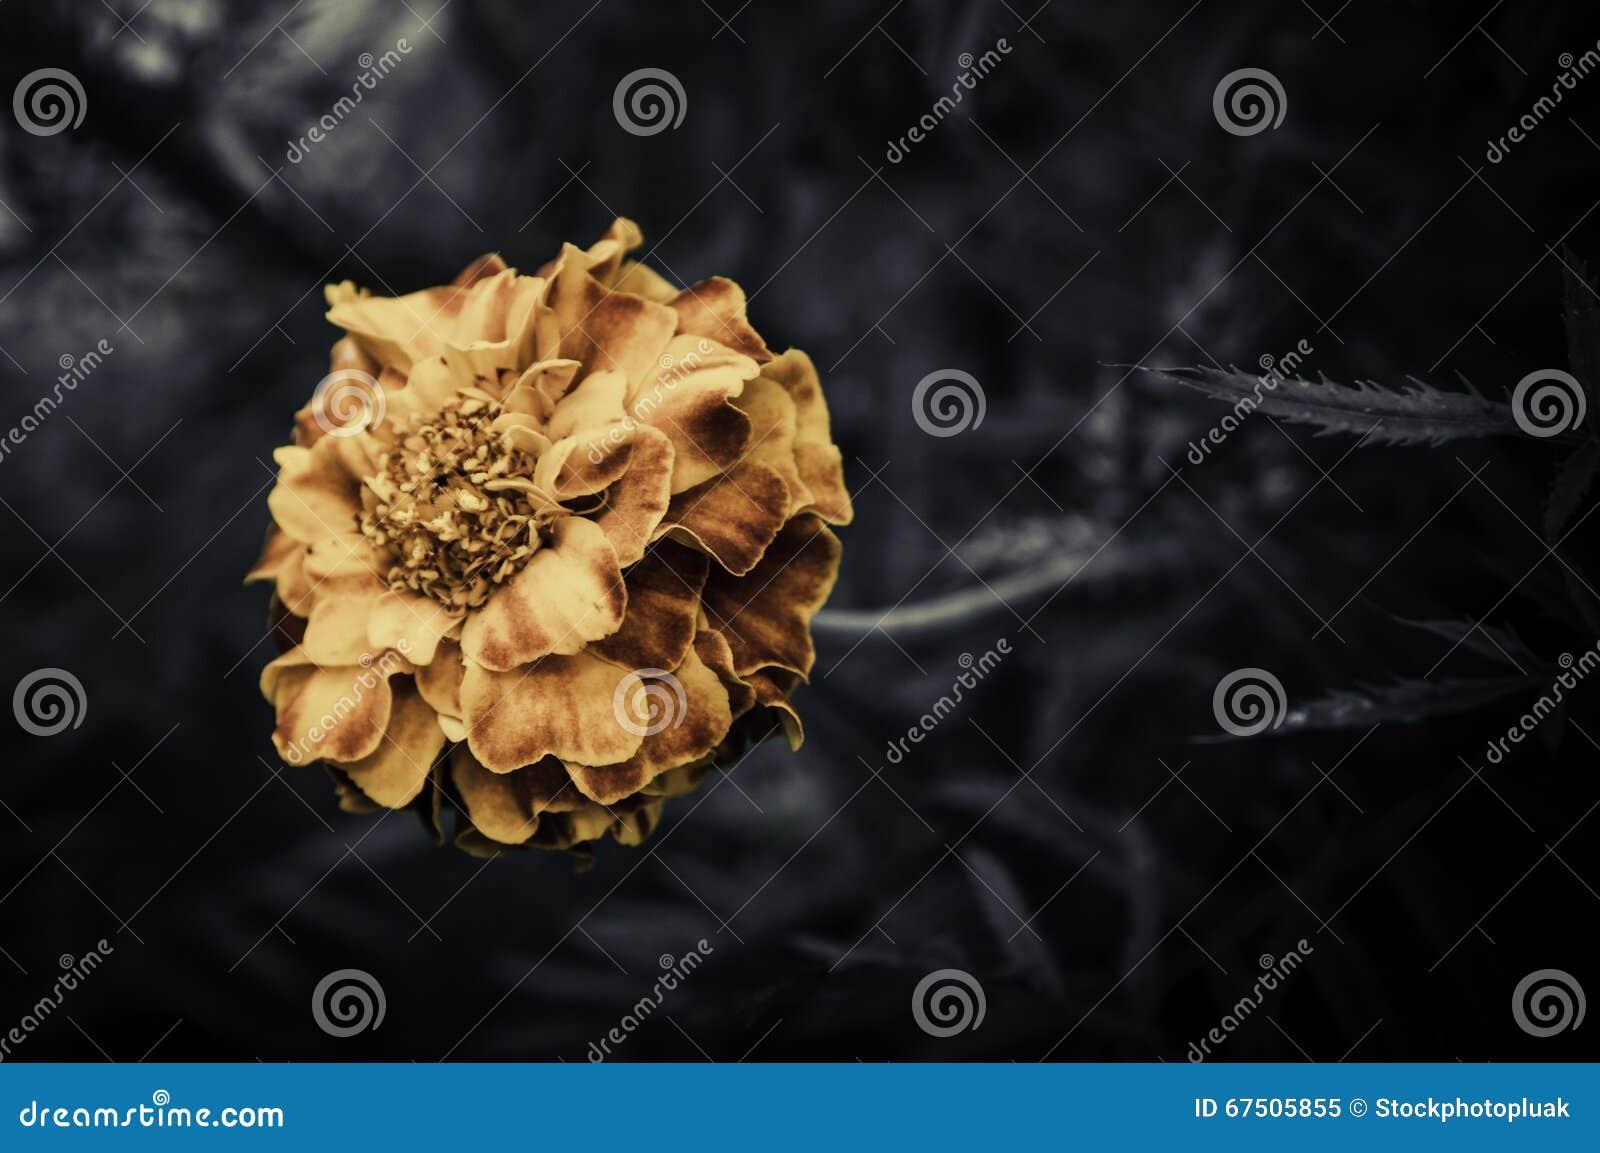 Retro flowers,Vintage Flowers background